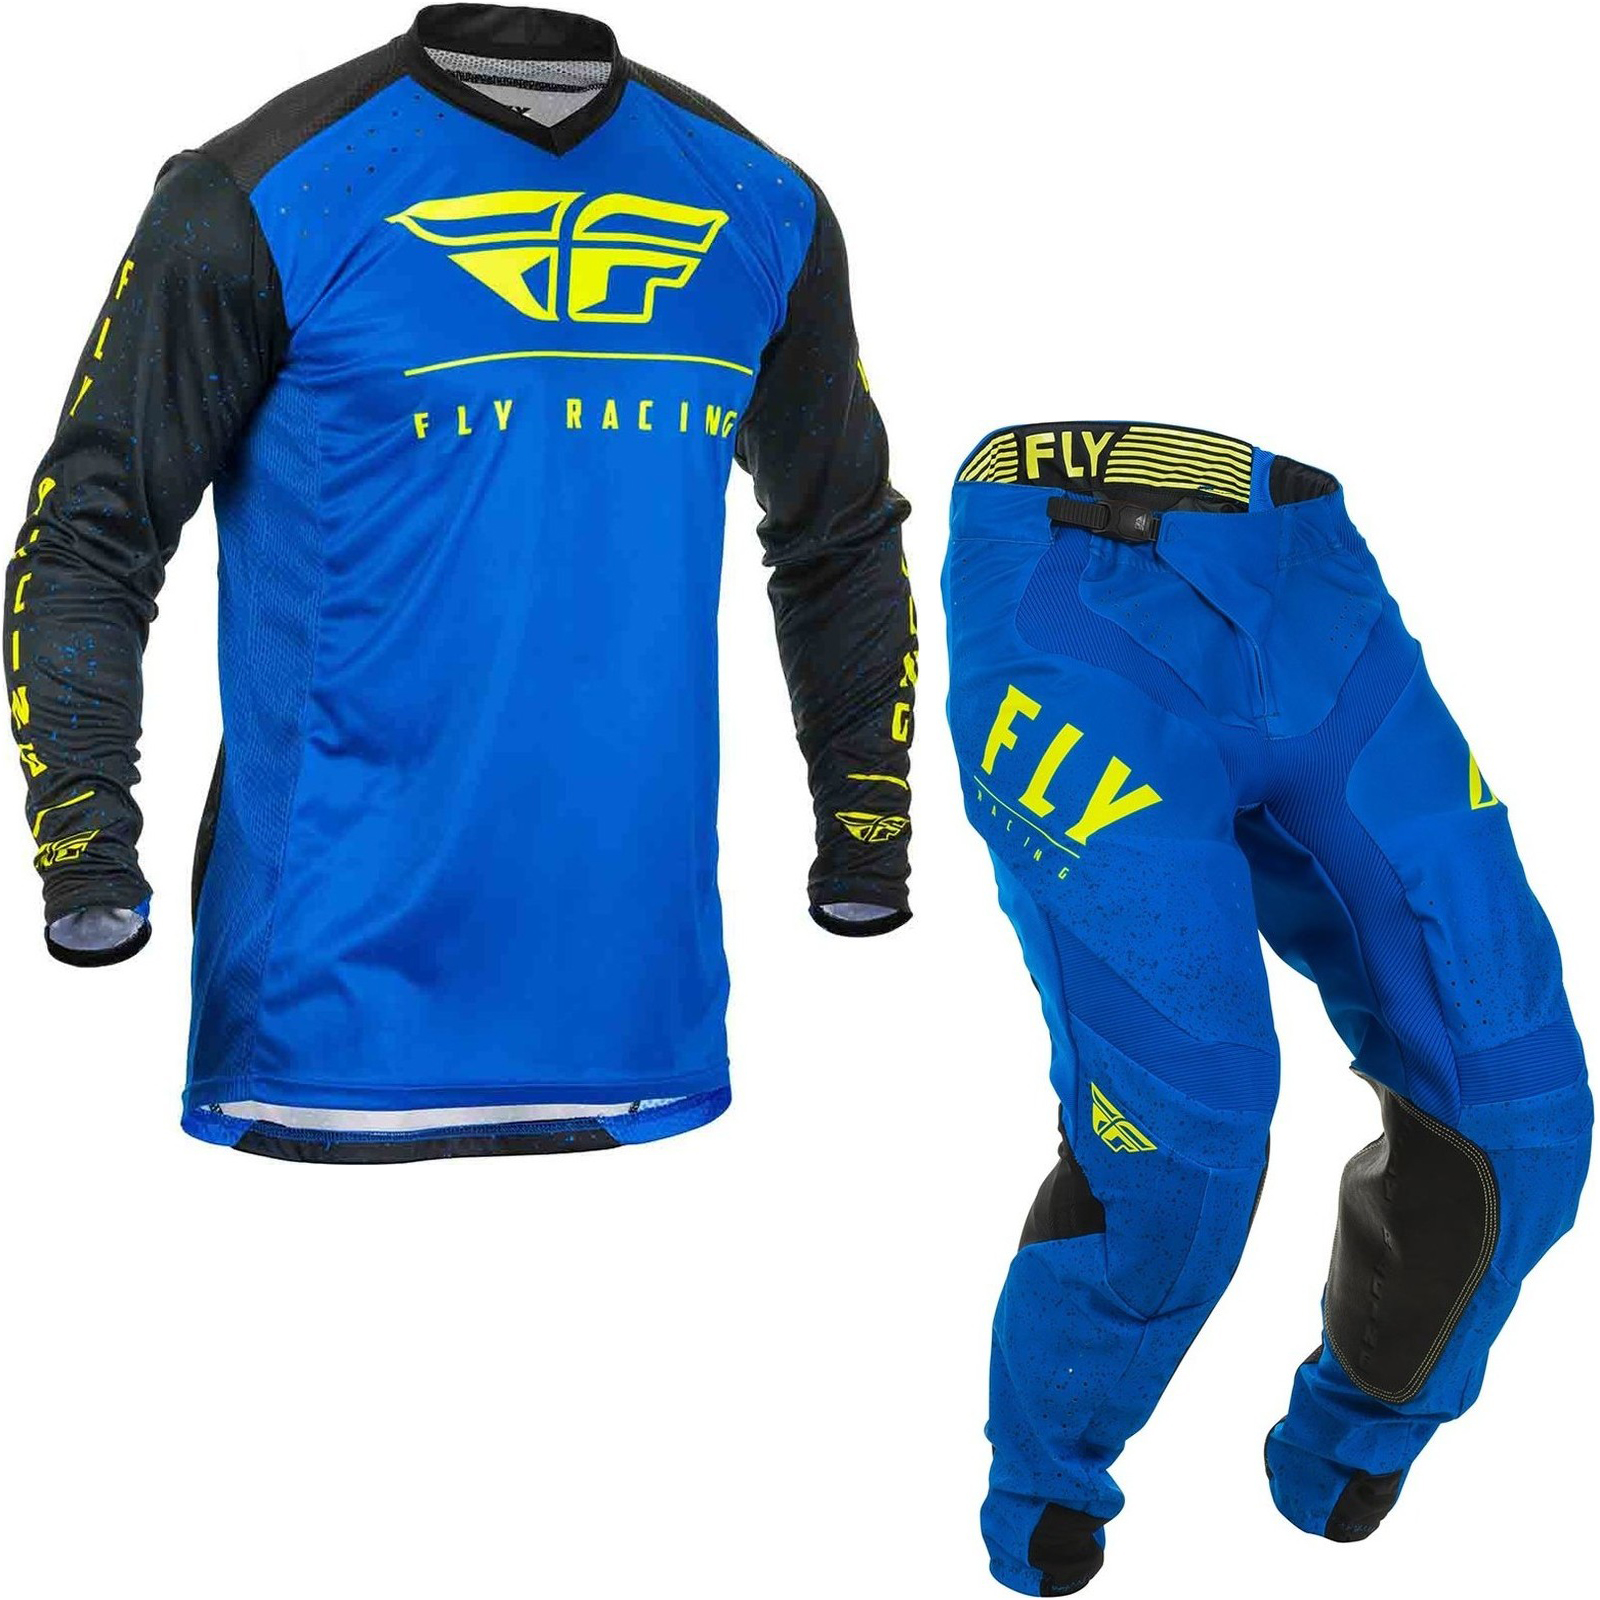 2019 Fly Racing Women/'s Lite Jersey Pant Combo Hi Vis Blue Motocross Gear MX